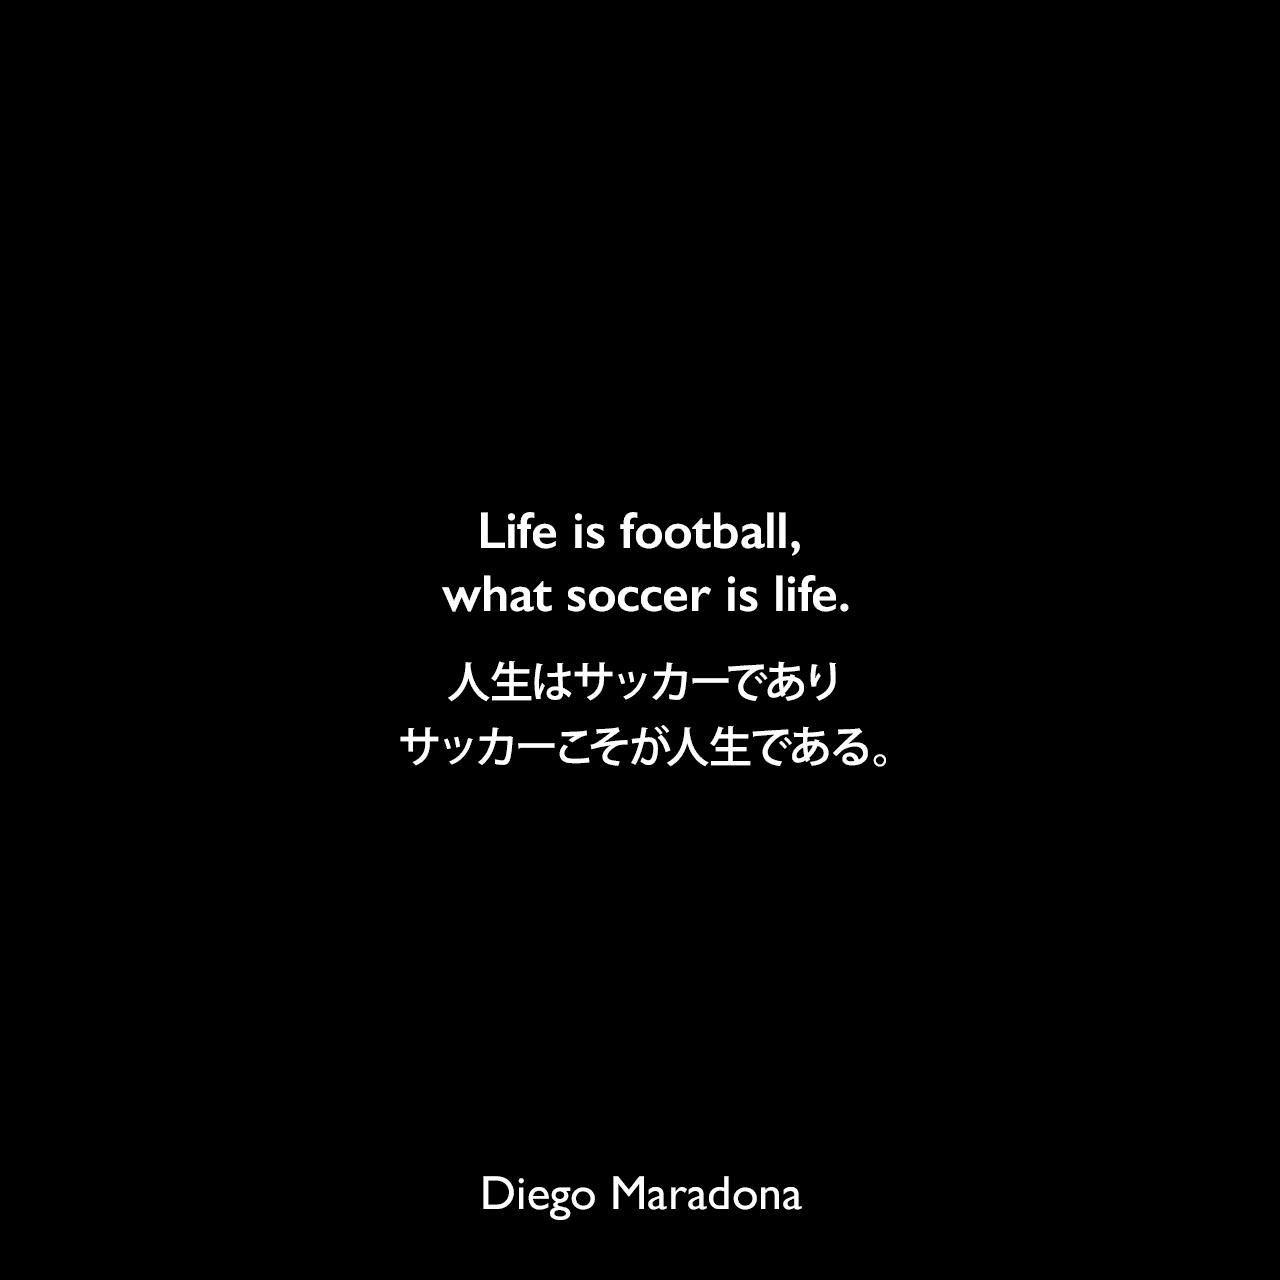 Life is football, what soccer is life.人生はサッカーであり、サッカーこそが人生である。Diego Maradona